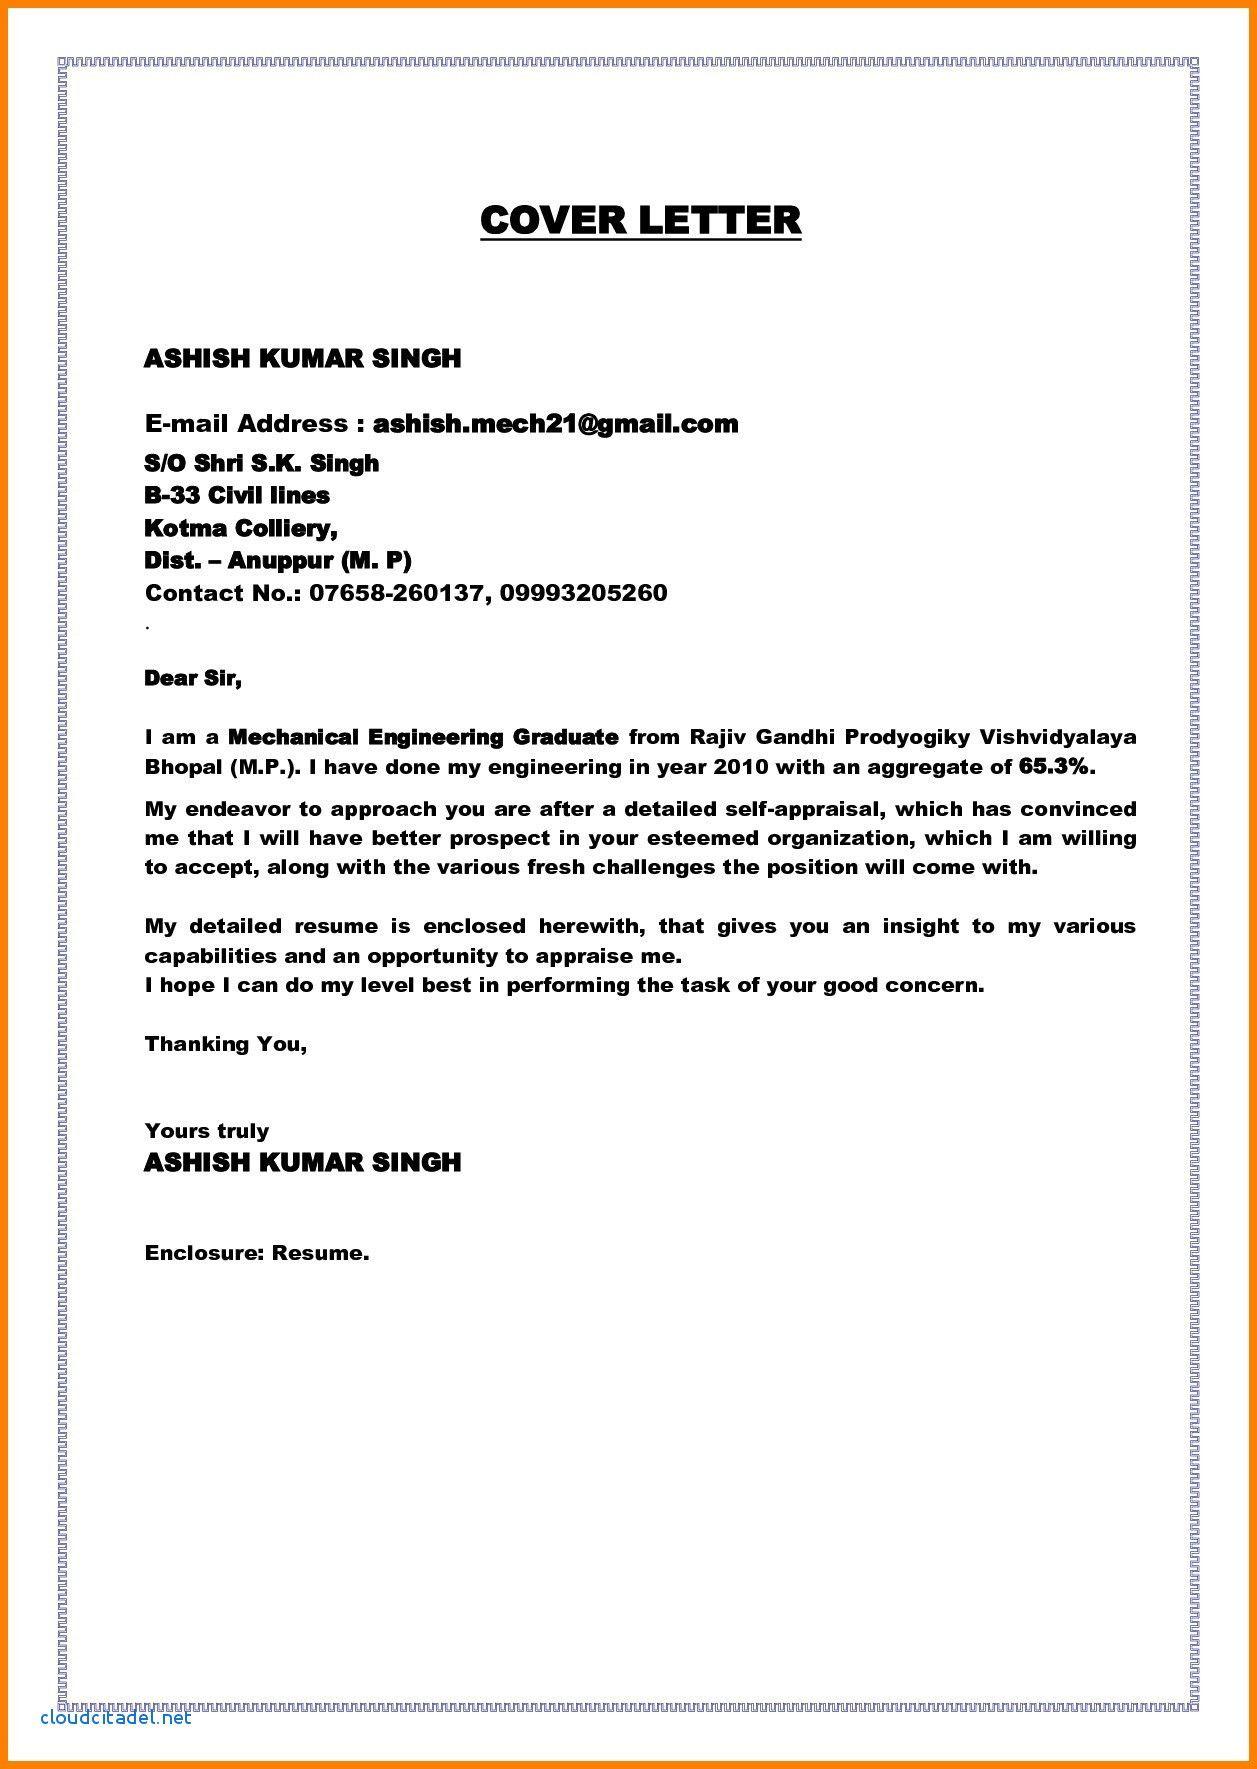 Graduate Nurse Cover Letter Cover Letter Example Job Cover Letter Job Application Cover Letter